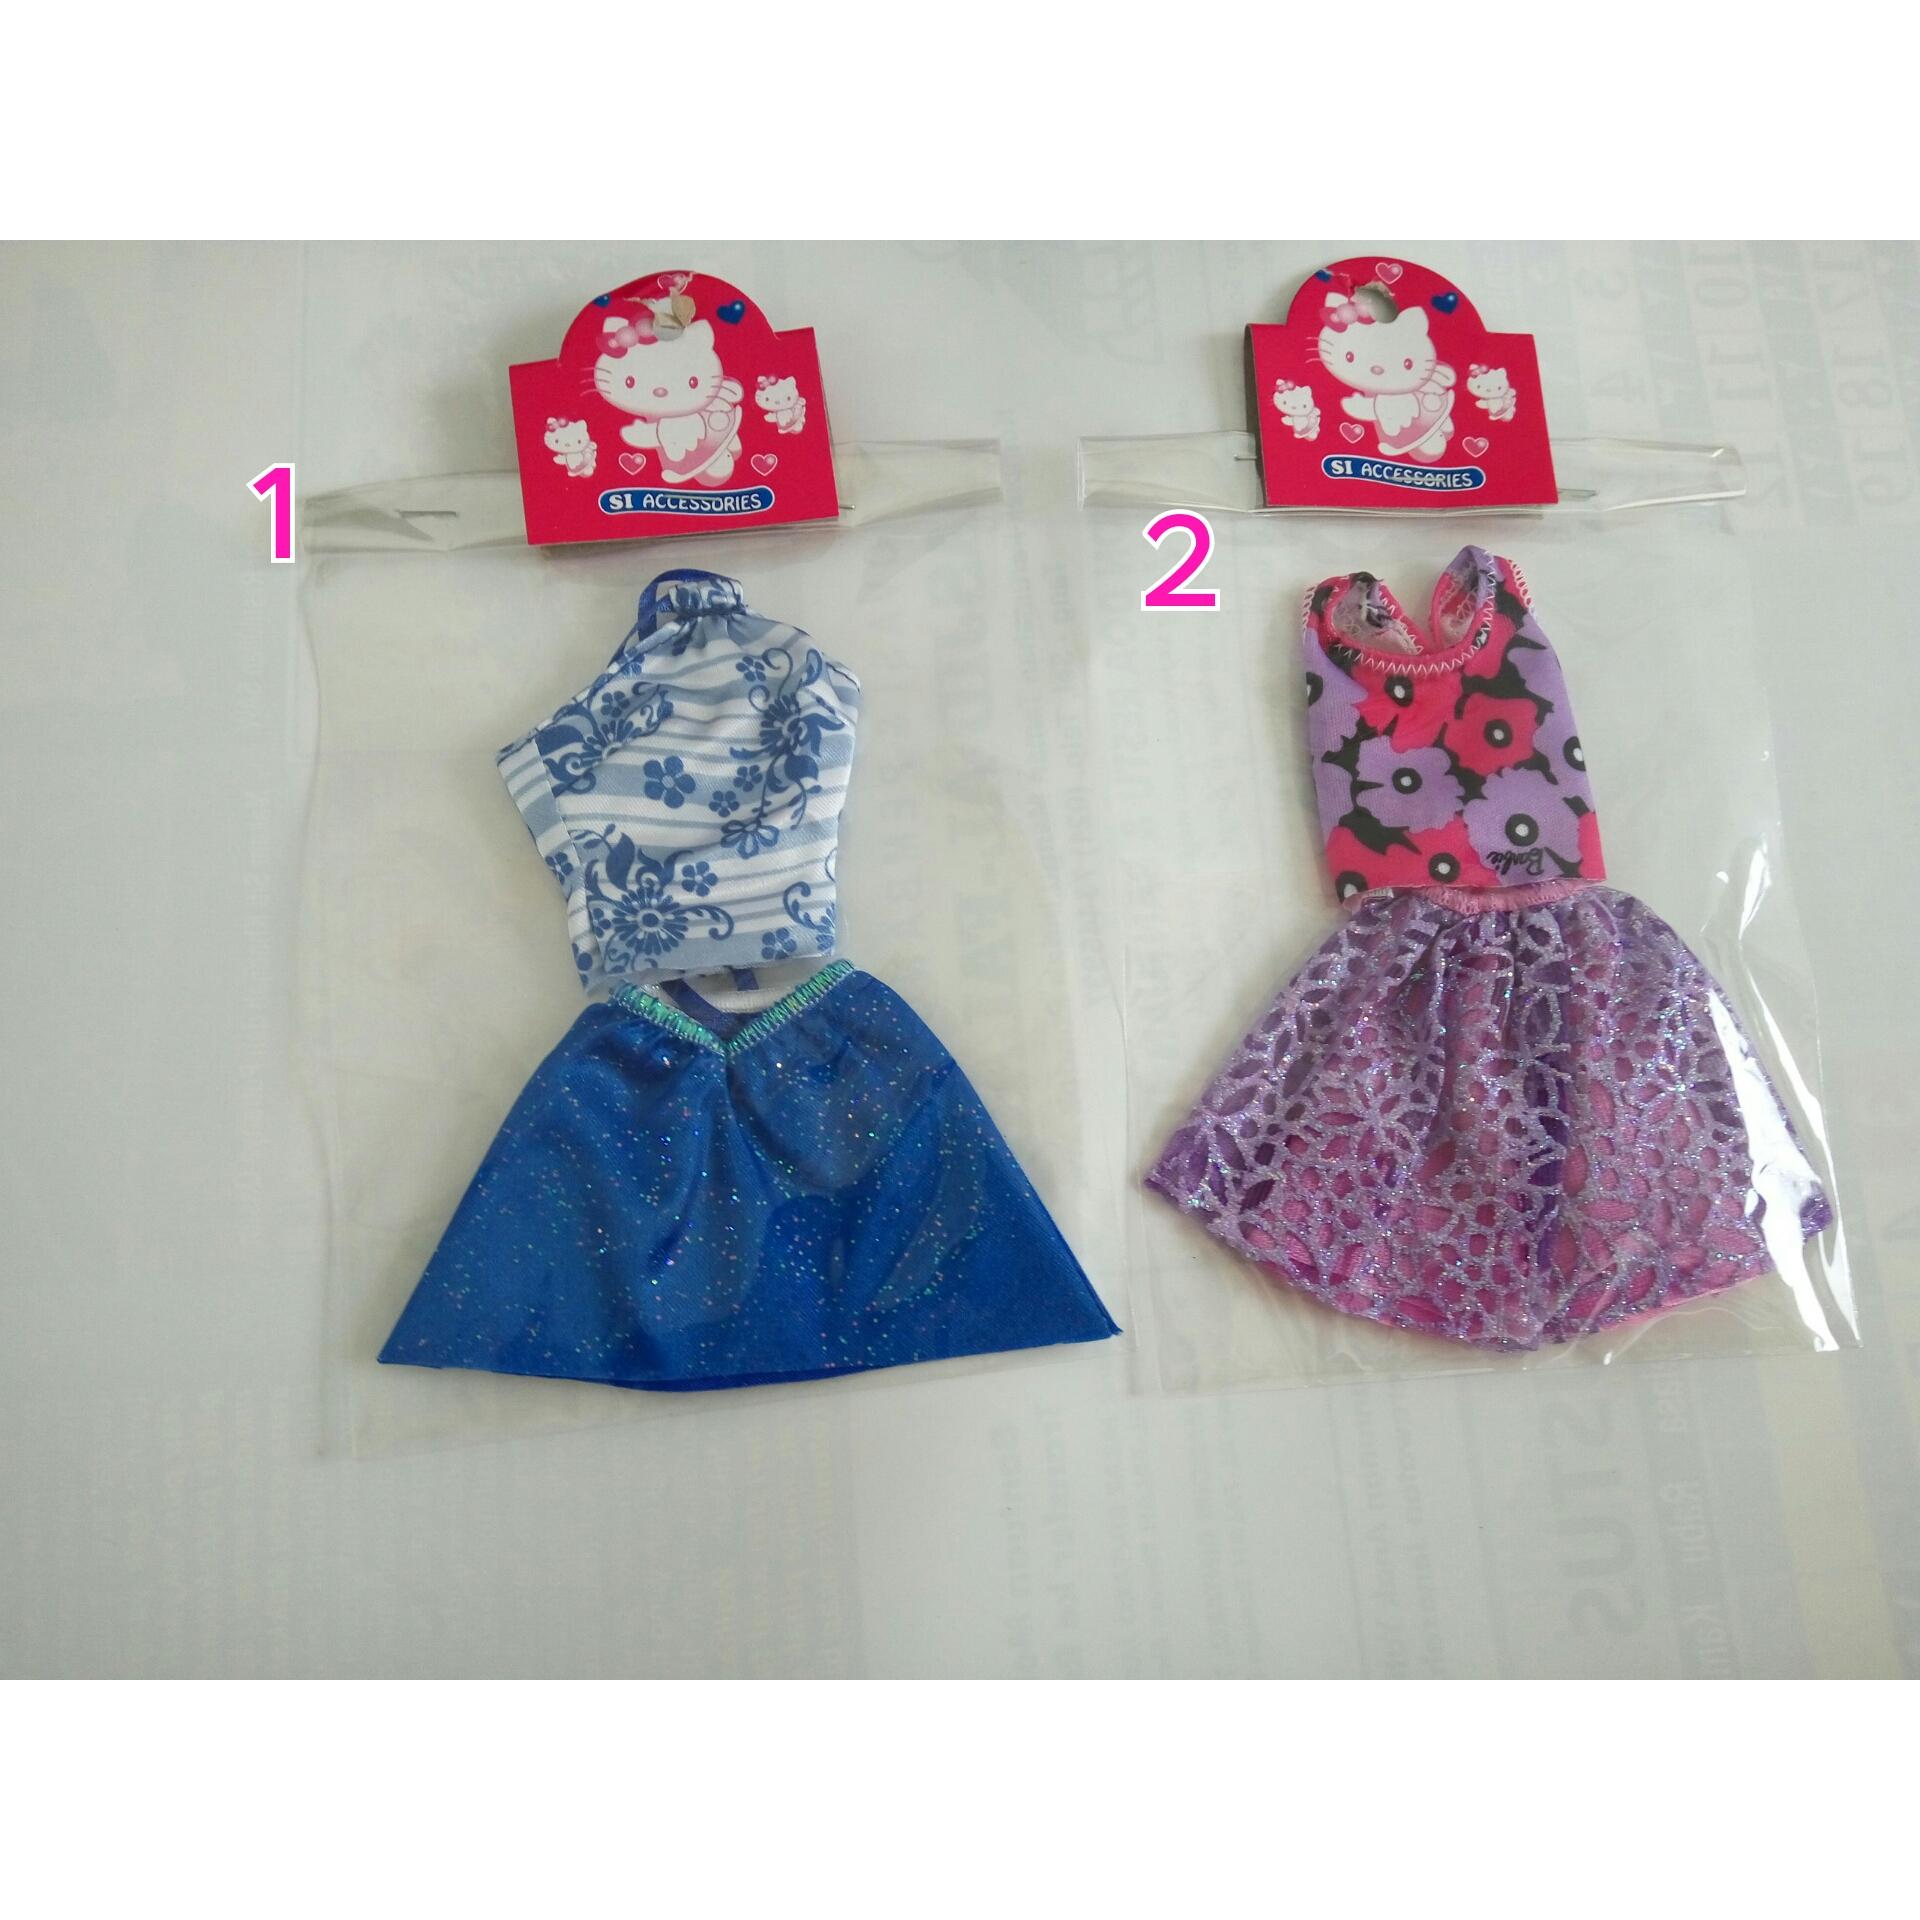 3 Daftar Harga Baju Barbie Dress Cantik Terbaru 2017 Lengkap Katalog Berbie Mattel Mini